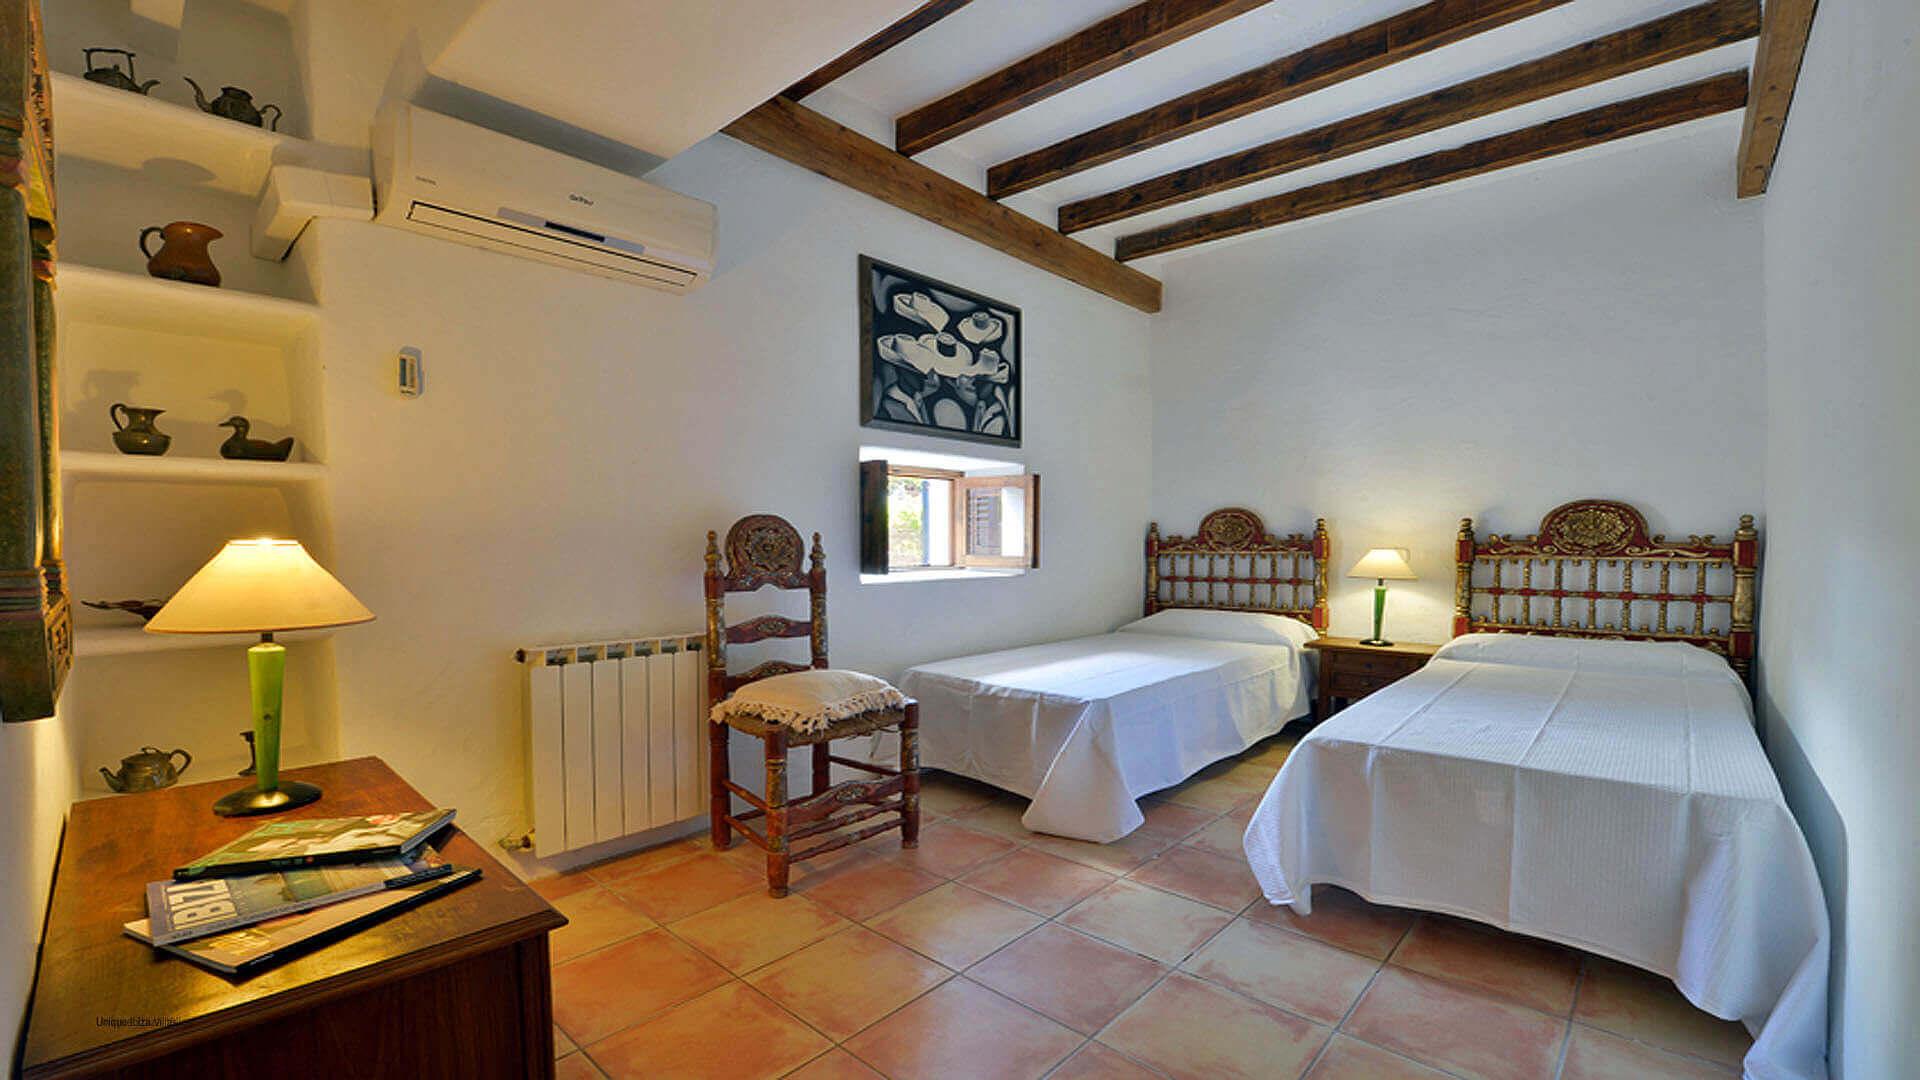 Villa Jaume Dalt Ibiza 21 Bedroom 3